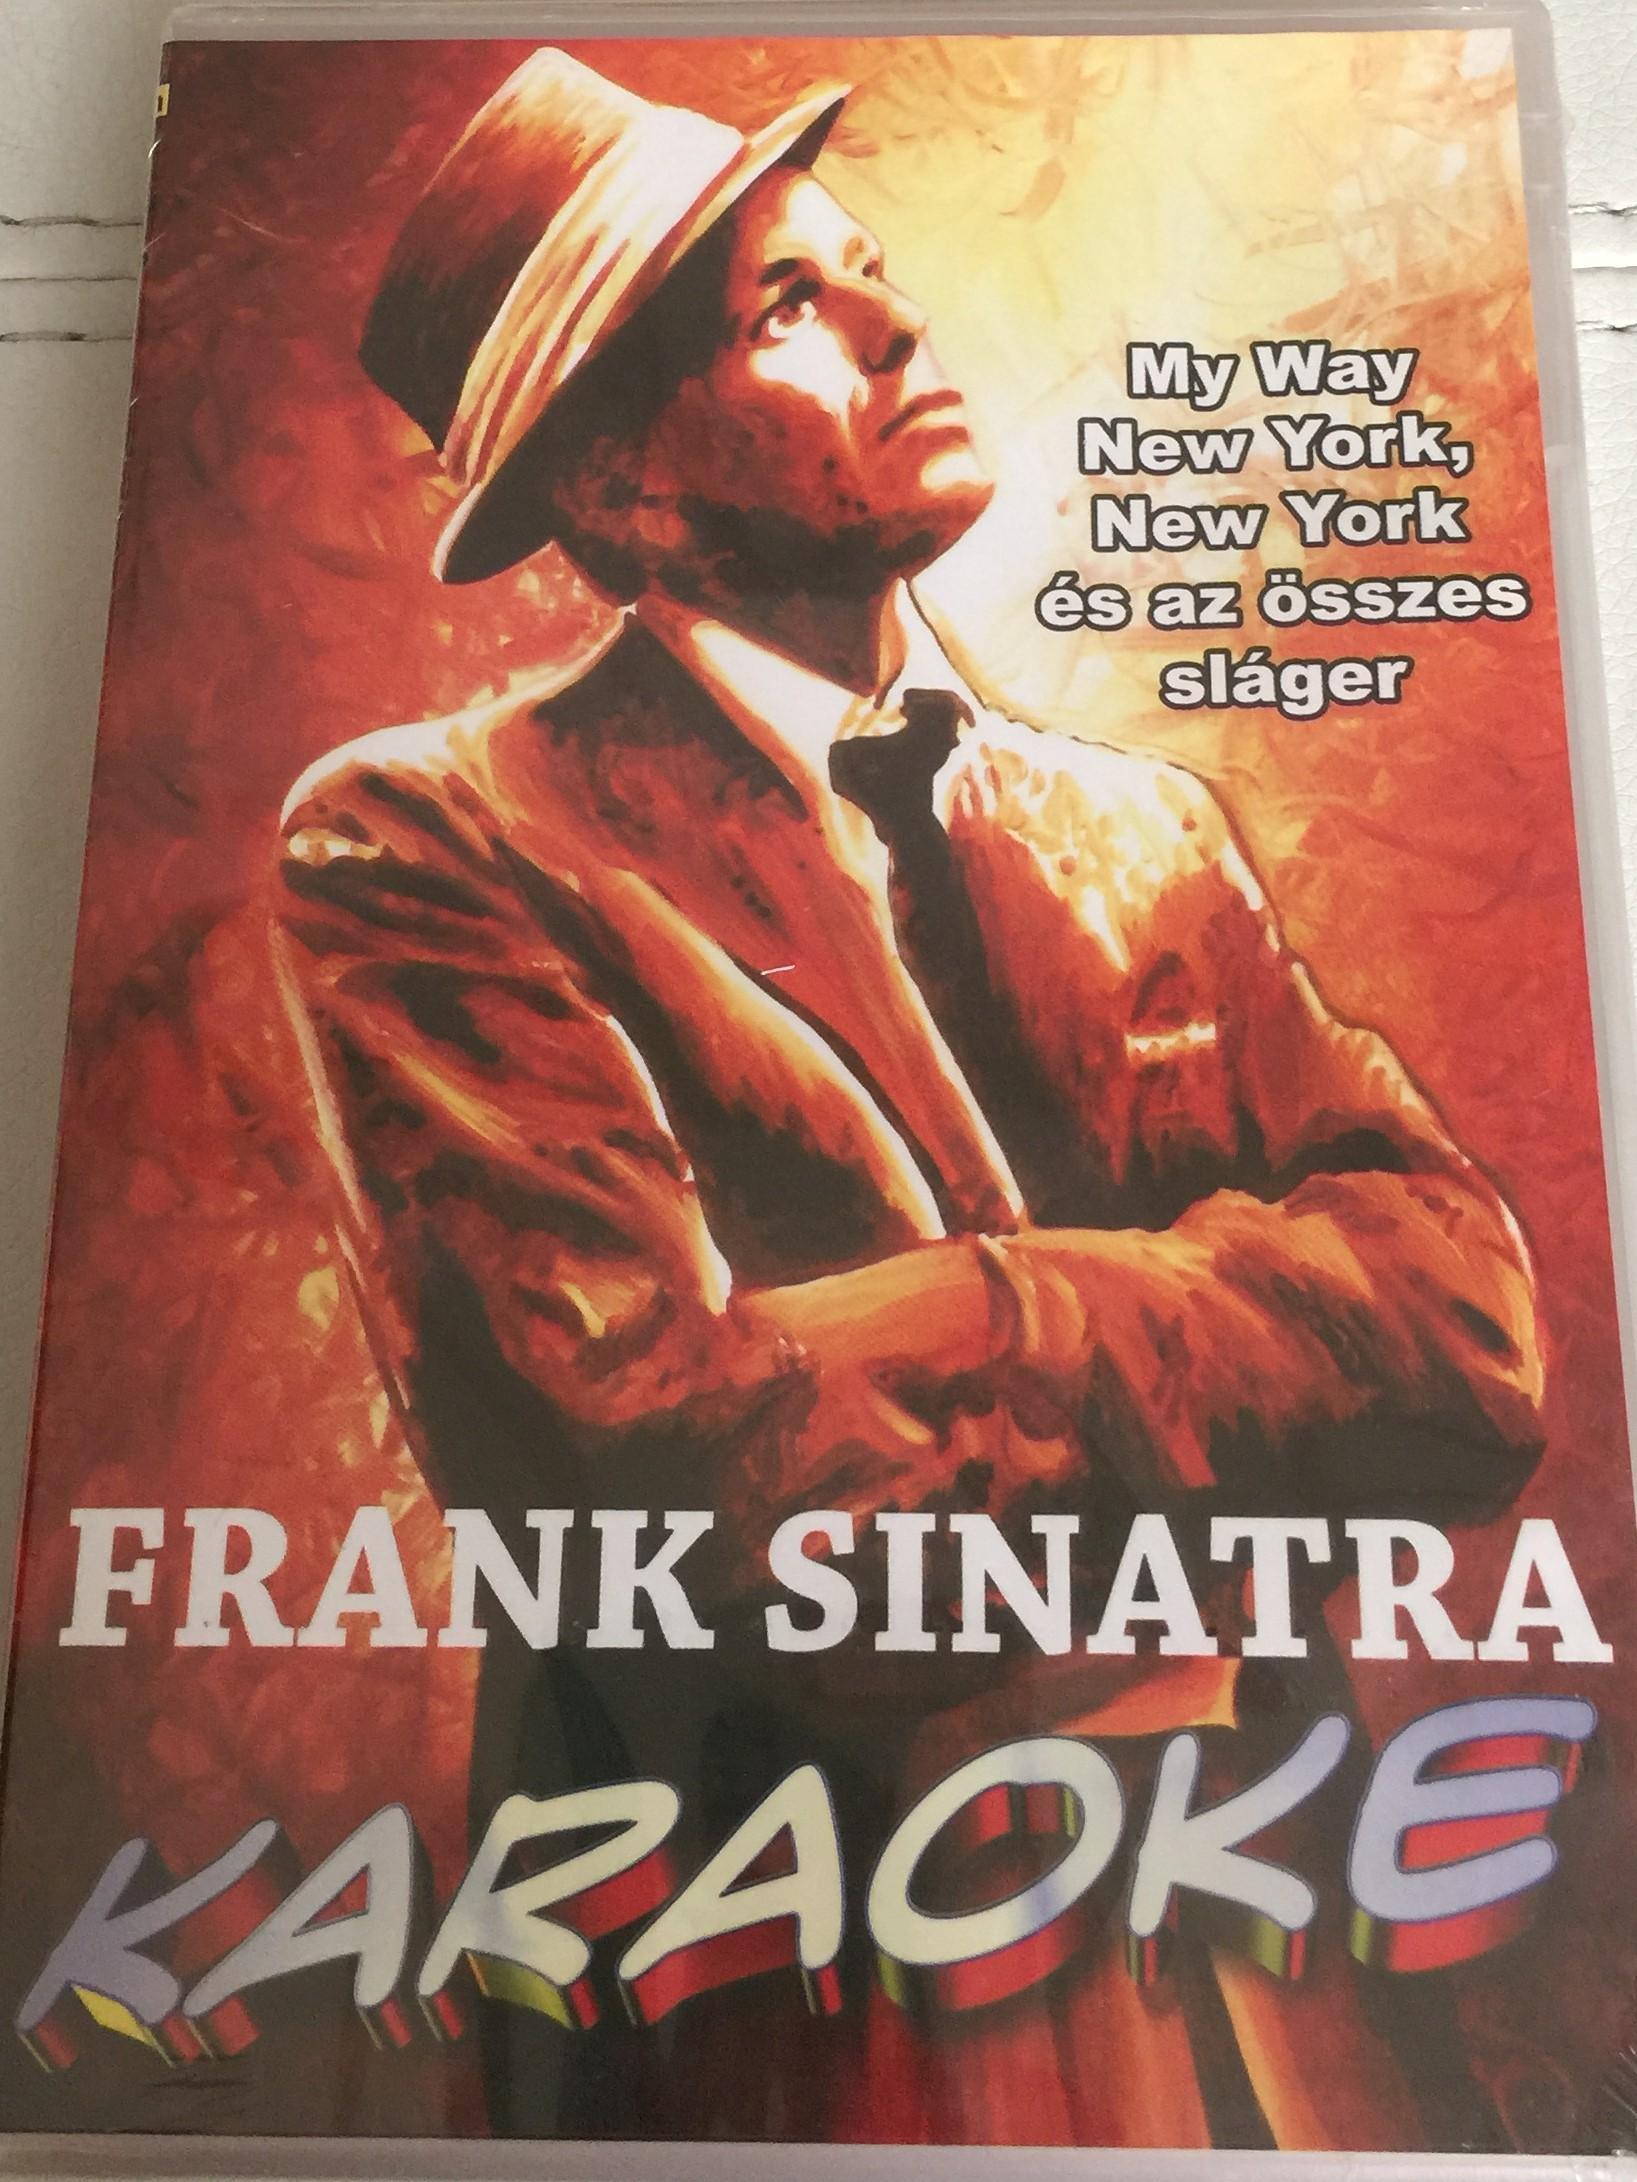 frank-sinatra-karaoke-dvd-sing-the-greatest-hits-nekeld-a-legnagyobb-sikereket-1.jpg